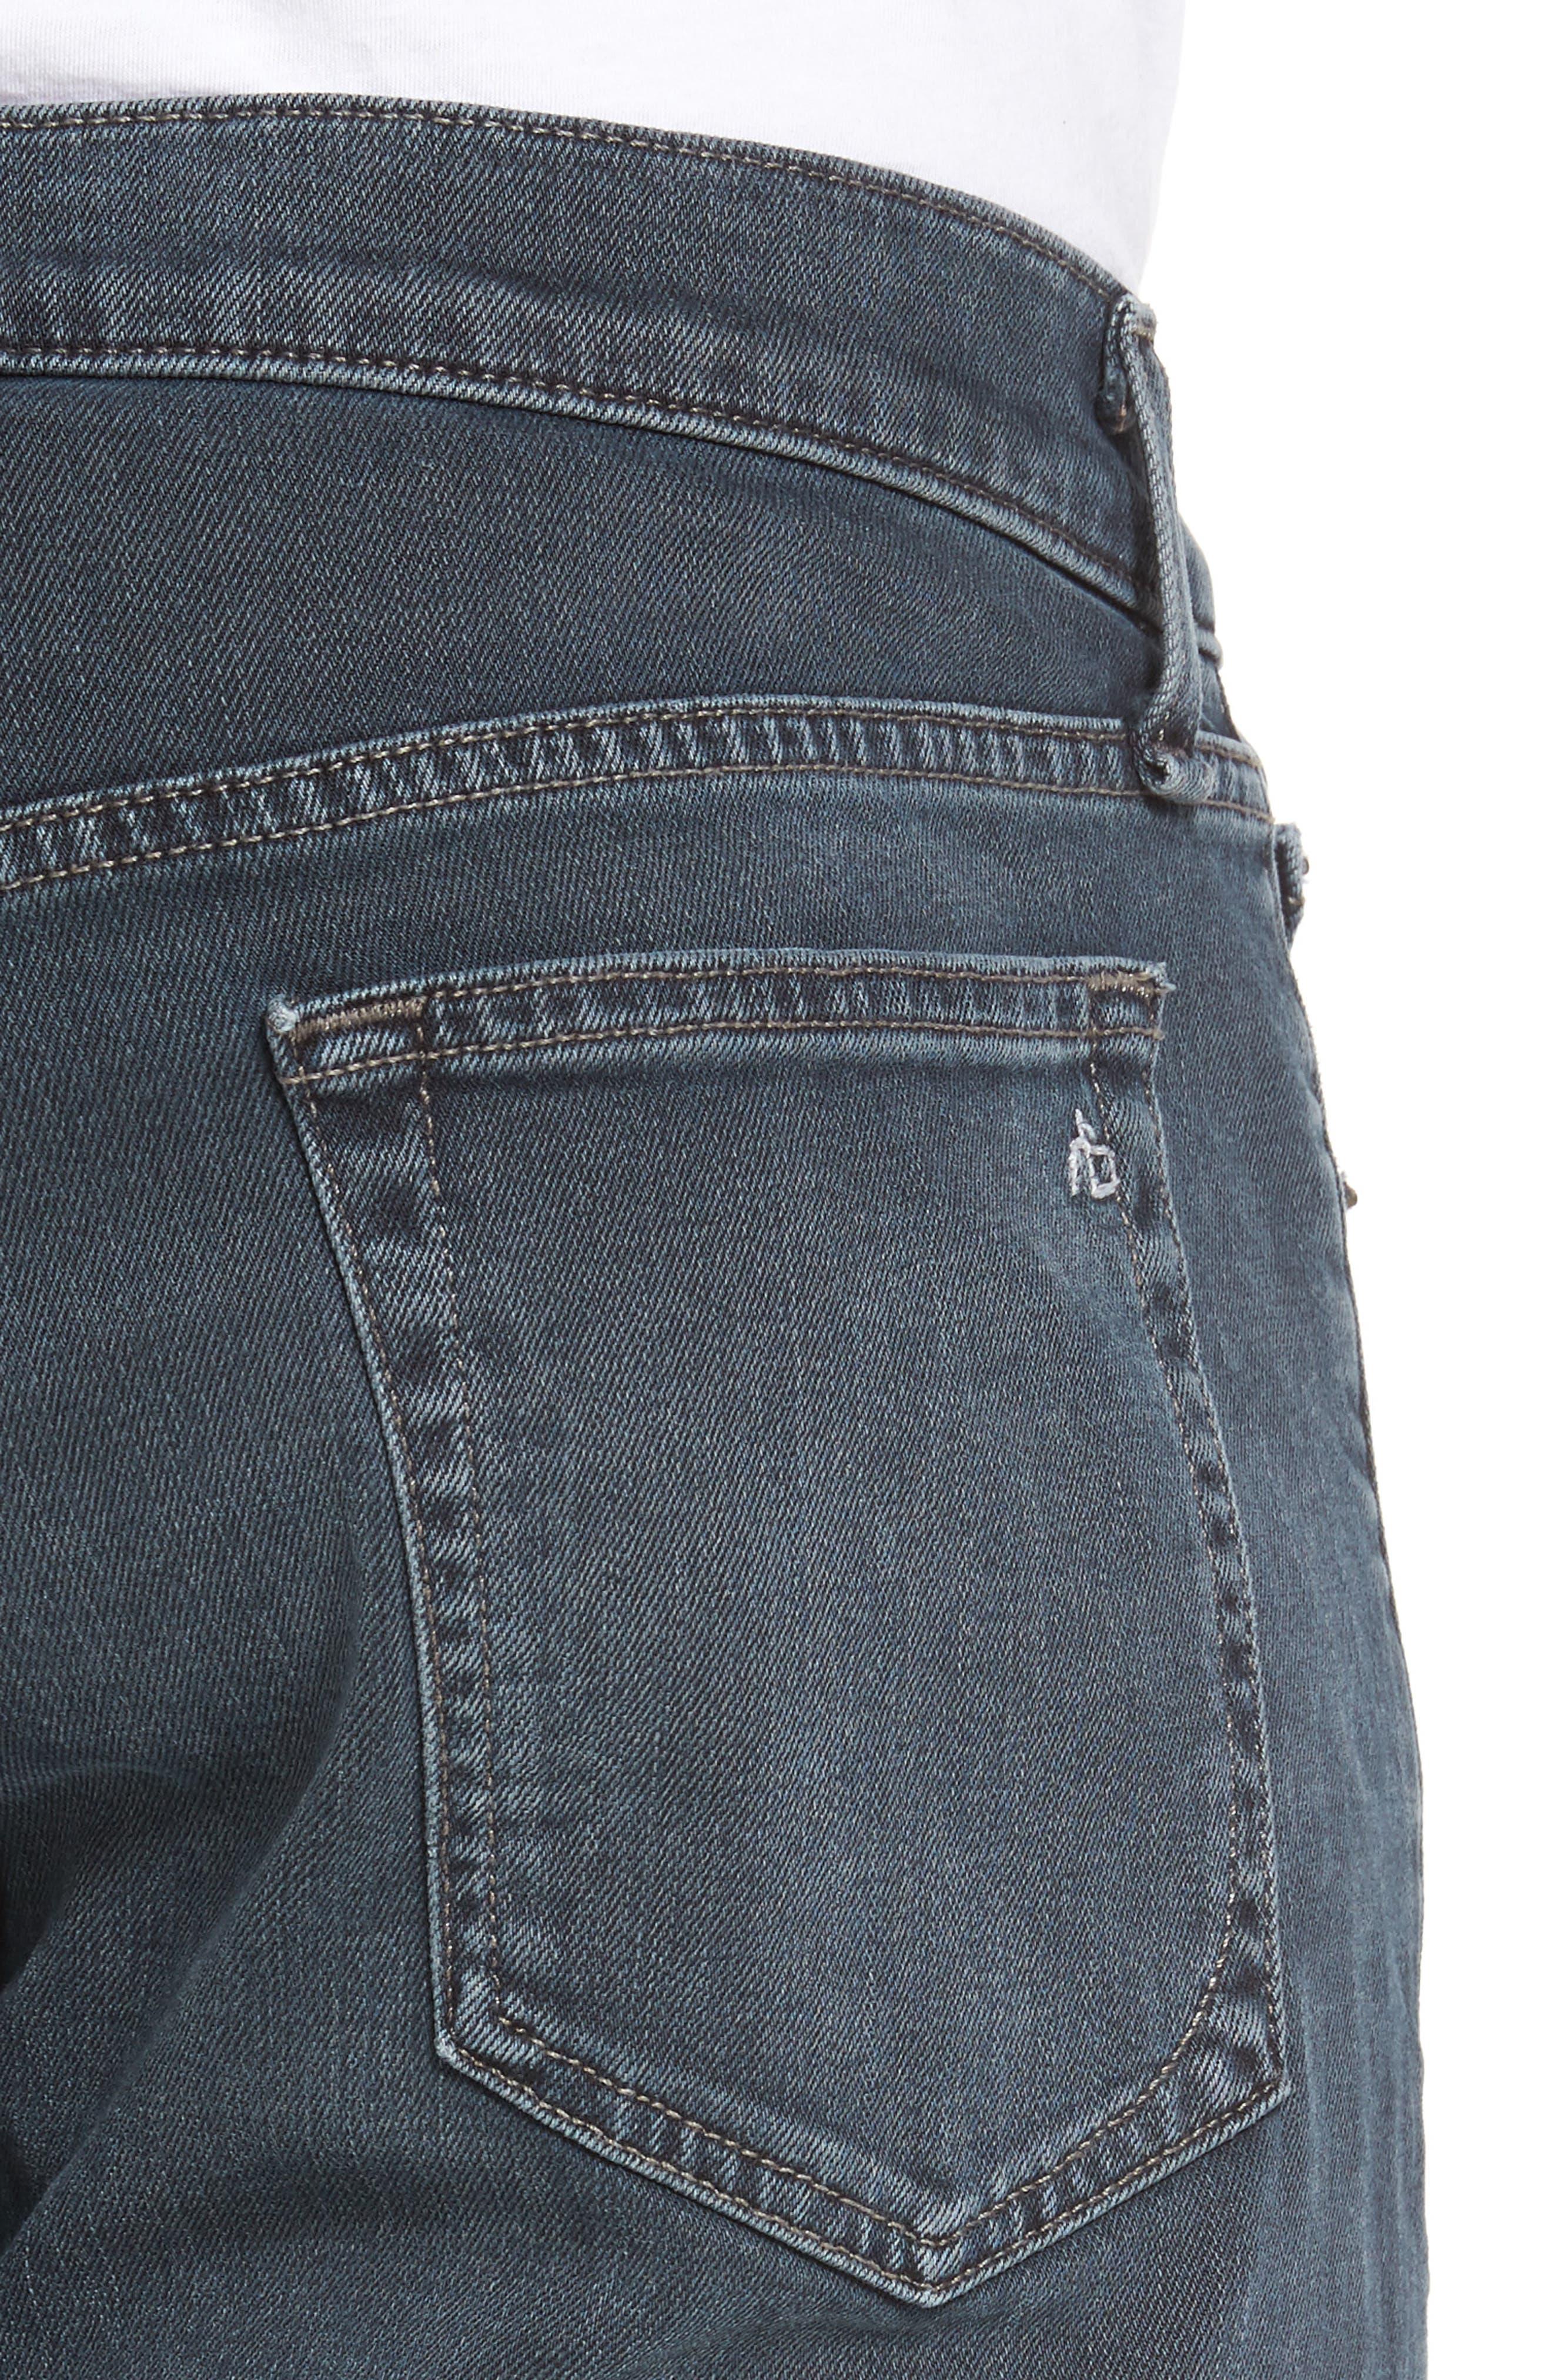 Fit 2 Slim Fit Jean,                             Alternate thumbnail 4, color,                             MINNA